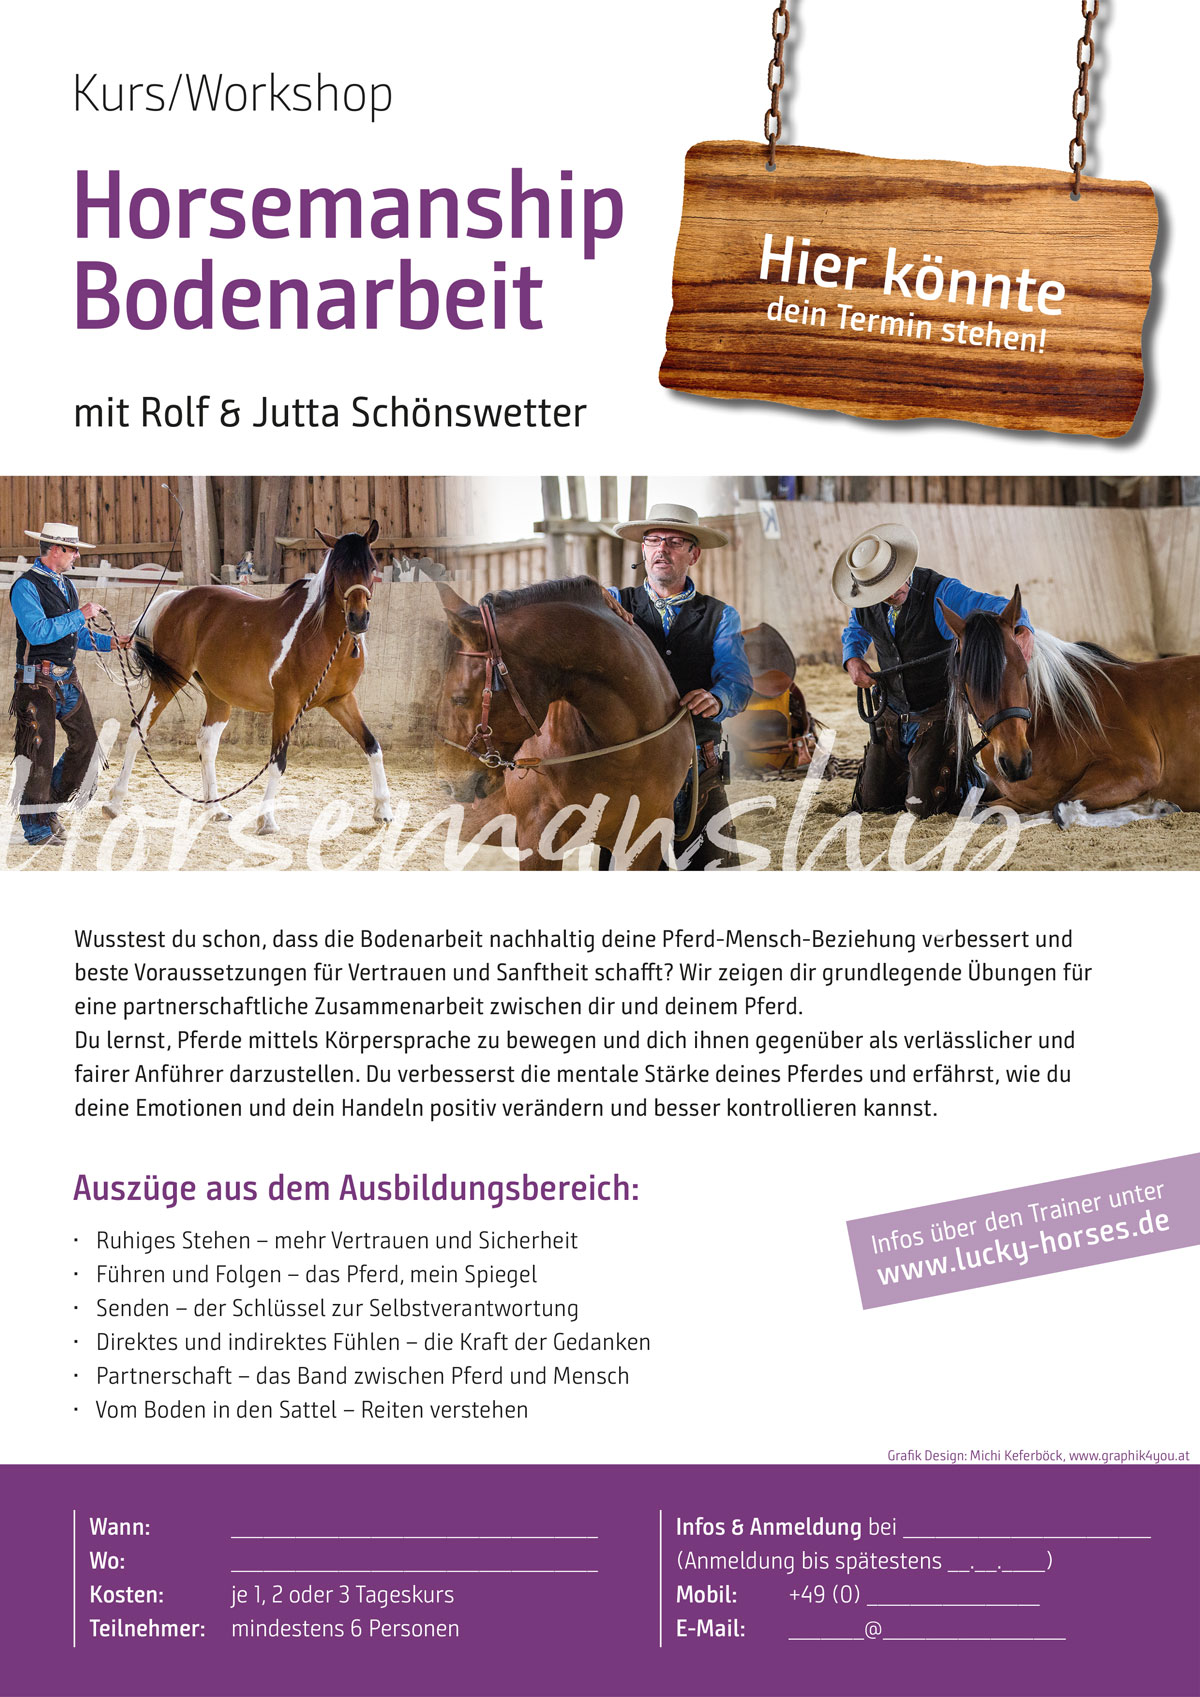 Kurs/Workshop Horsemanship Bodenarbeit